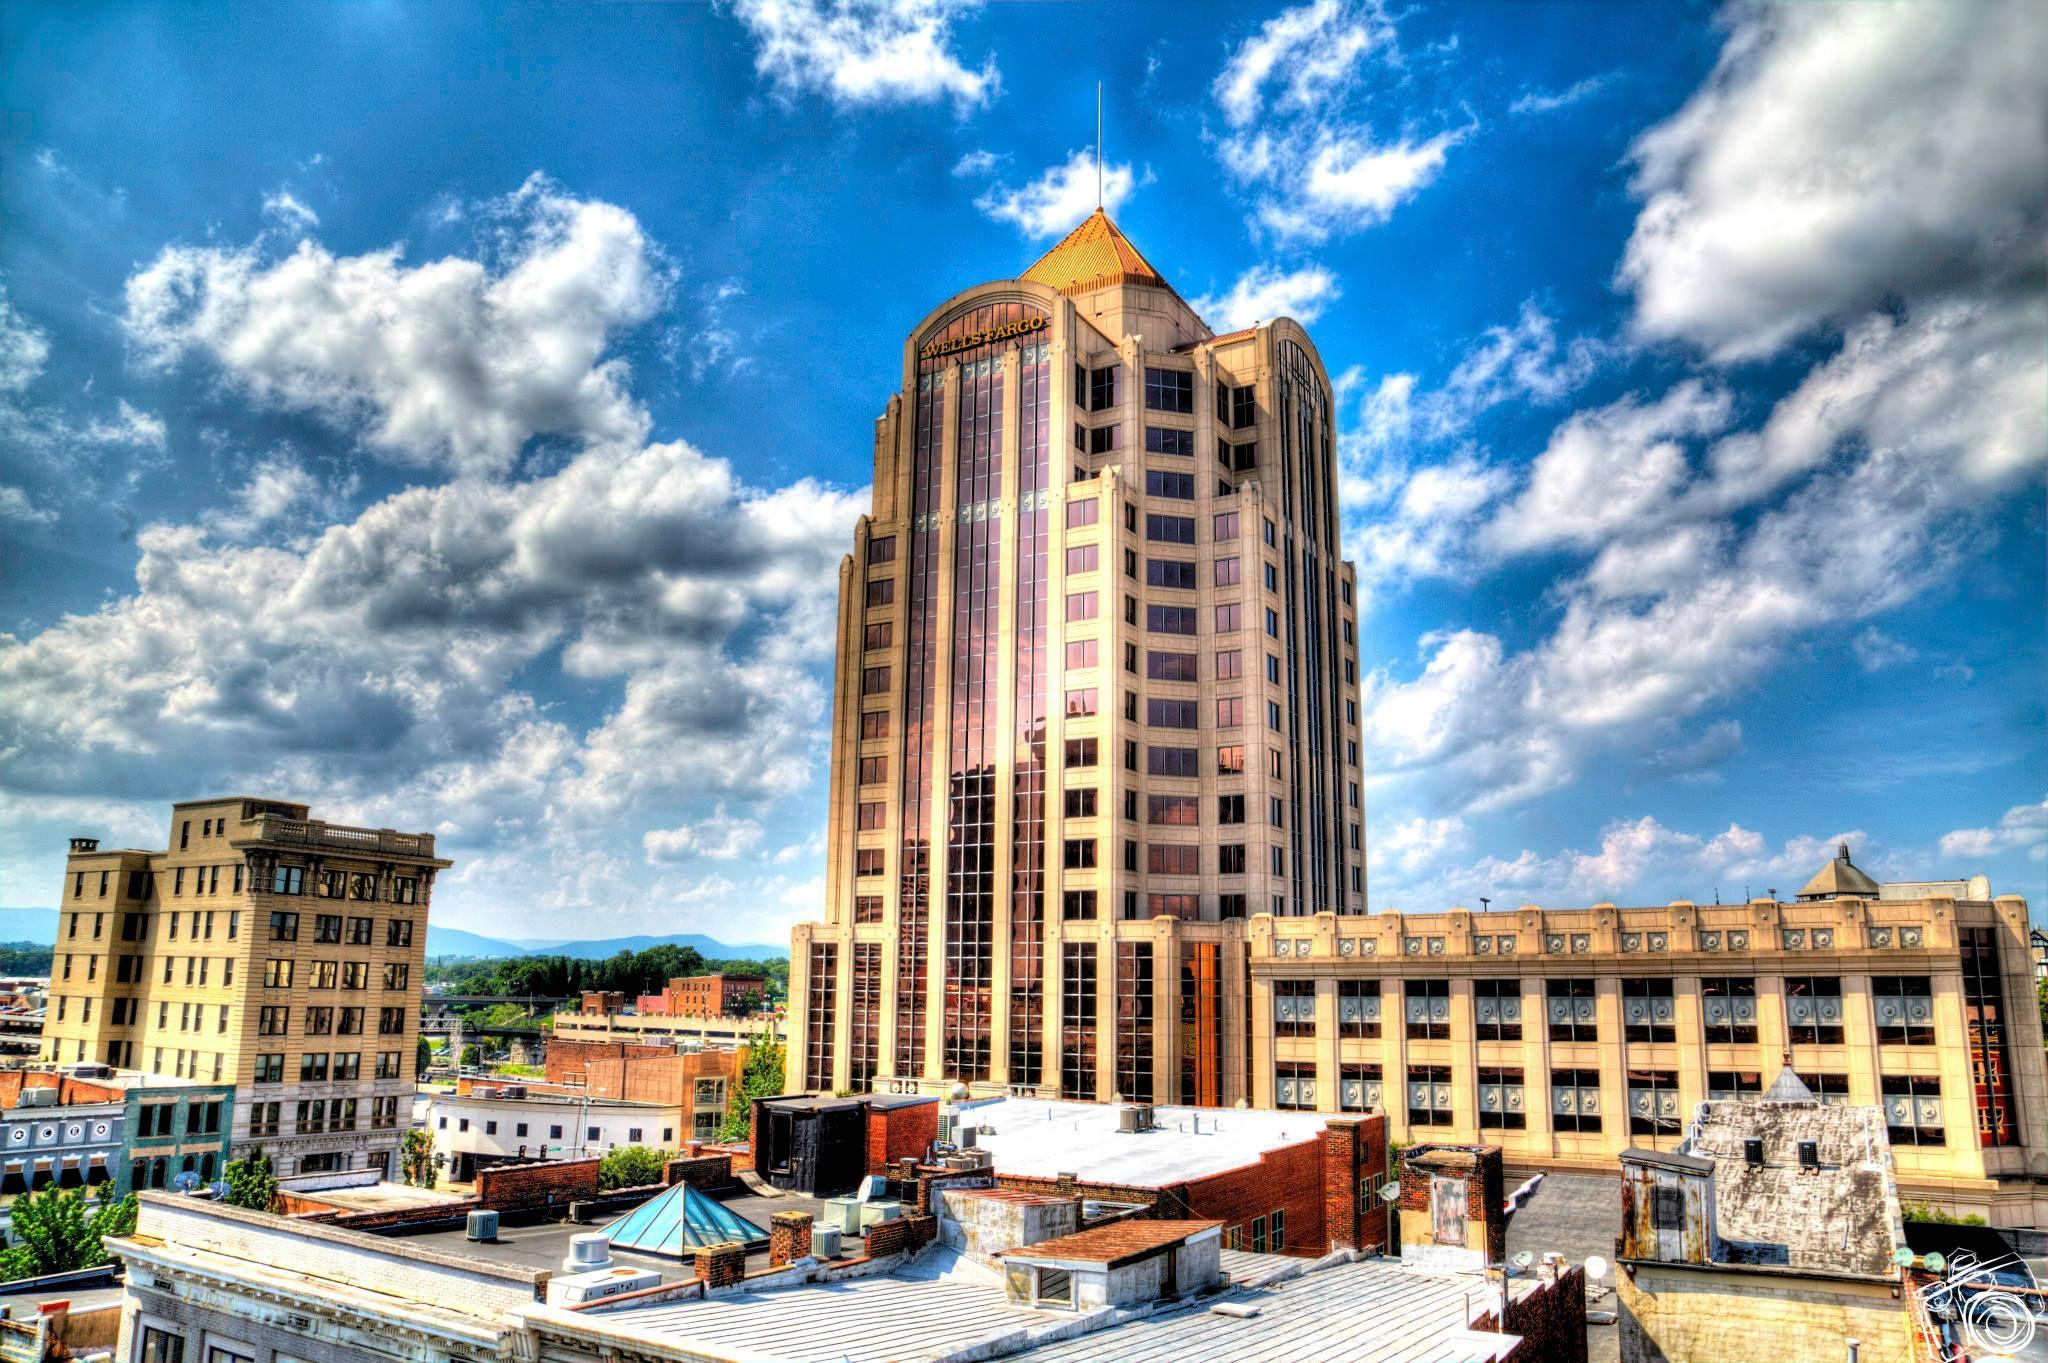 Wells Fargo Building In Roanoke Transcendence Photos Roanoke Historical Landmarks Magic City